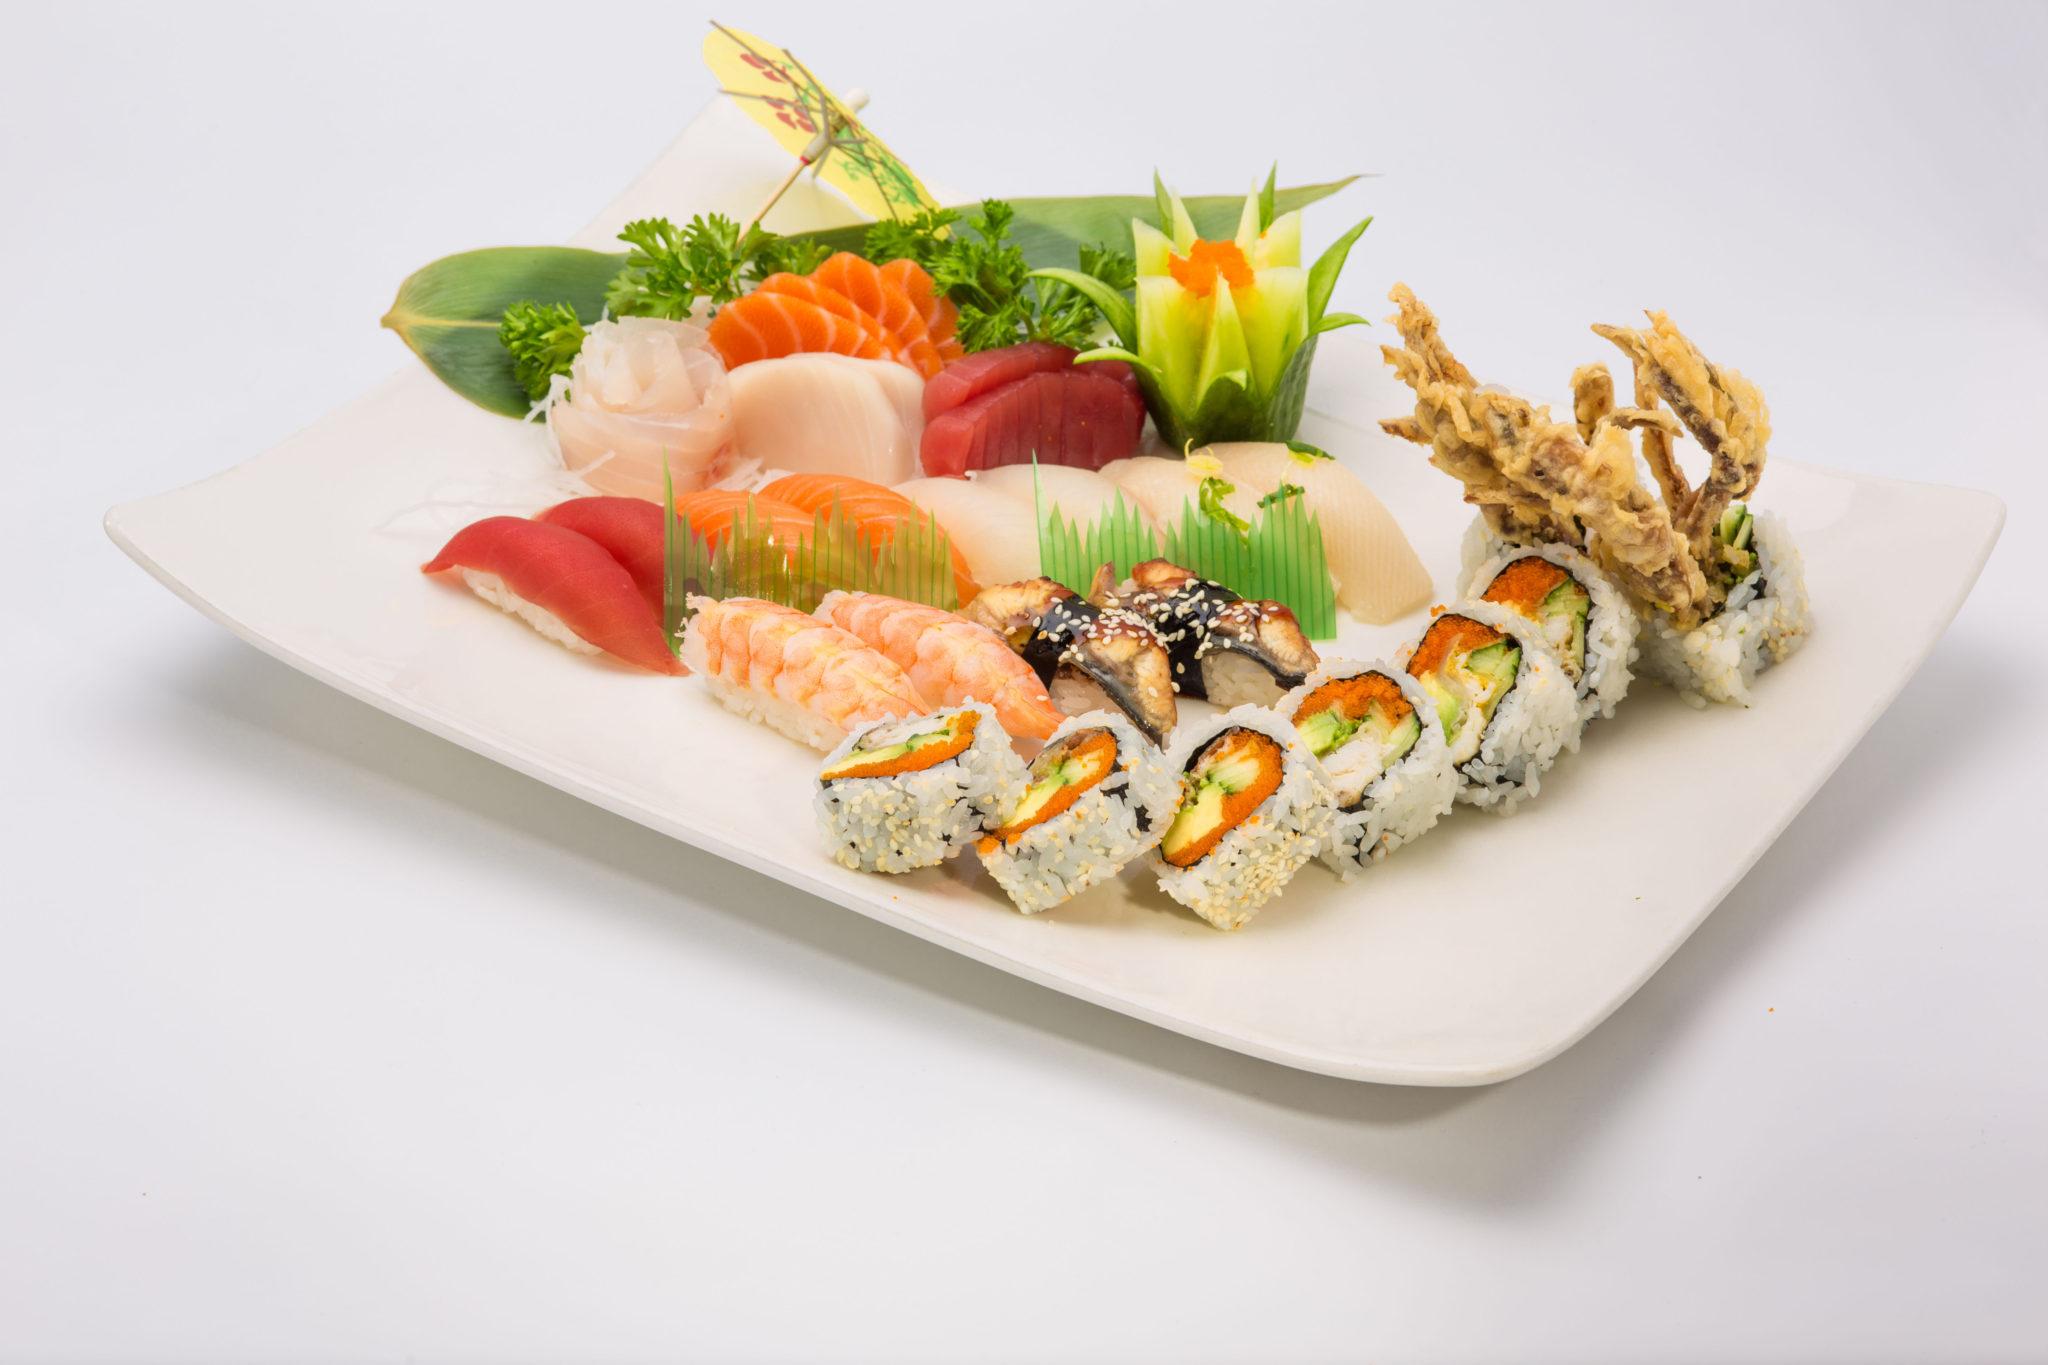 Sushi, Maki (Roll) Boat